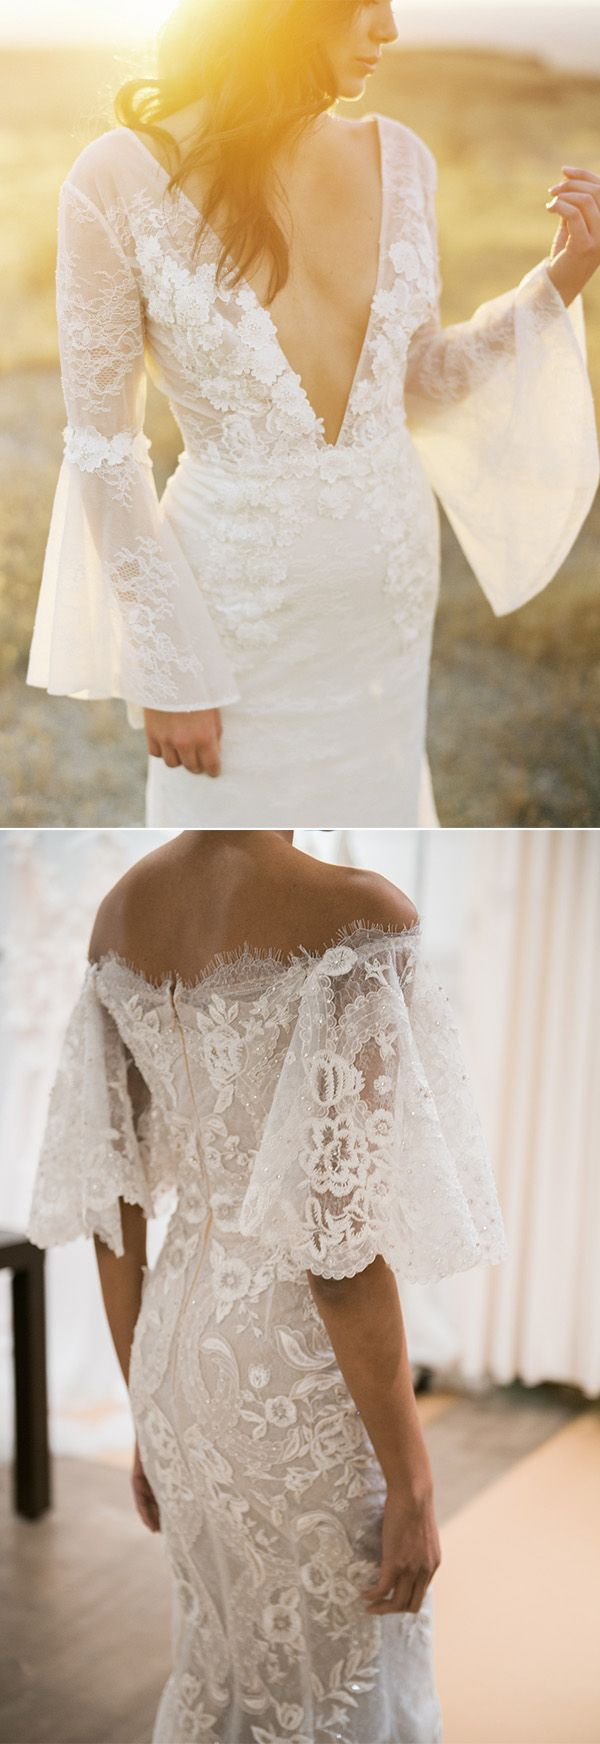 23 Stunning Wedding Dresses For 2018 Elegantweddinginvites Com Blog Wedding Dresses Bell Sleeve Wedding Dress Summer Wedding Dress Beach [ 1744 x 600 Pixel ]